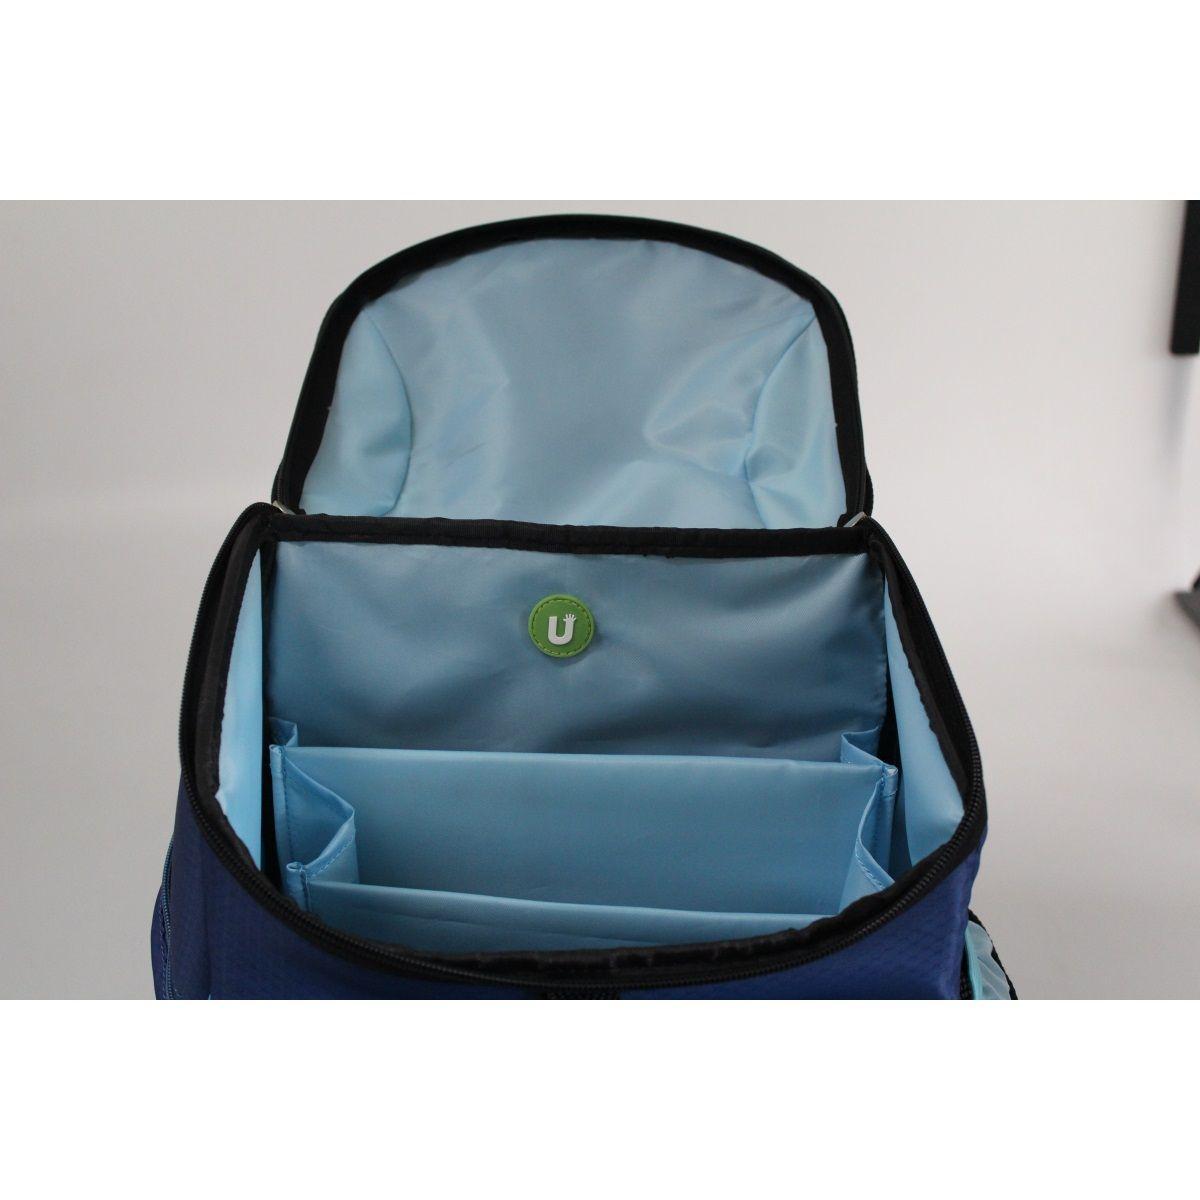 UPixel תיק גב לבית ספר פיקסלים - כחול